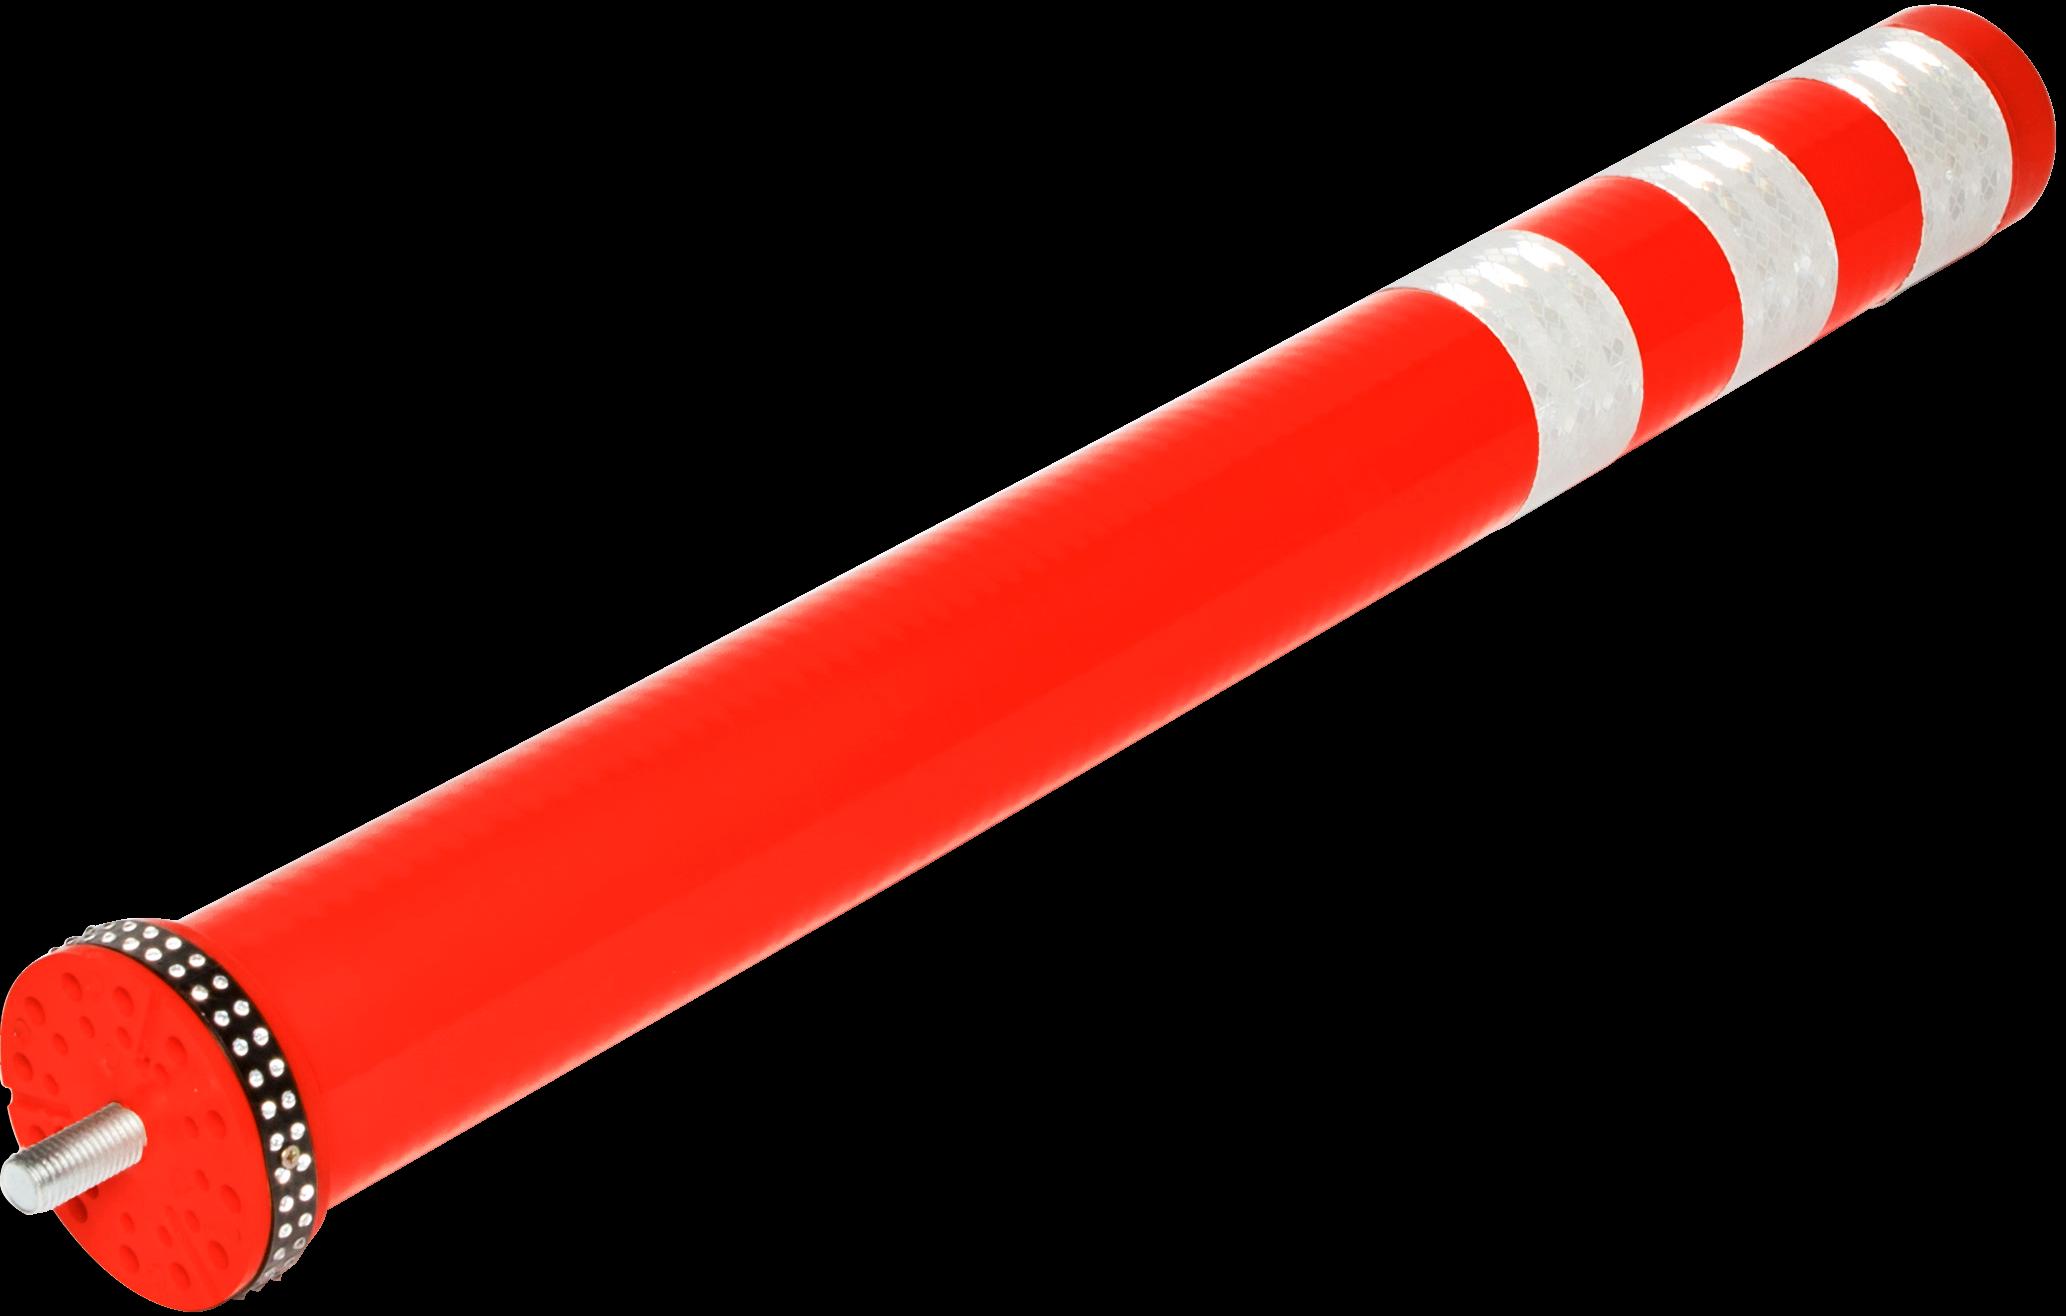 Smartpath flexibele paal rood, diam. 80 mm, H 800 mm